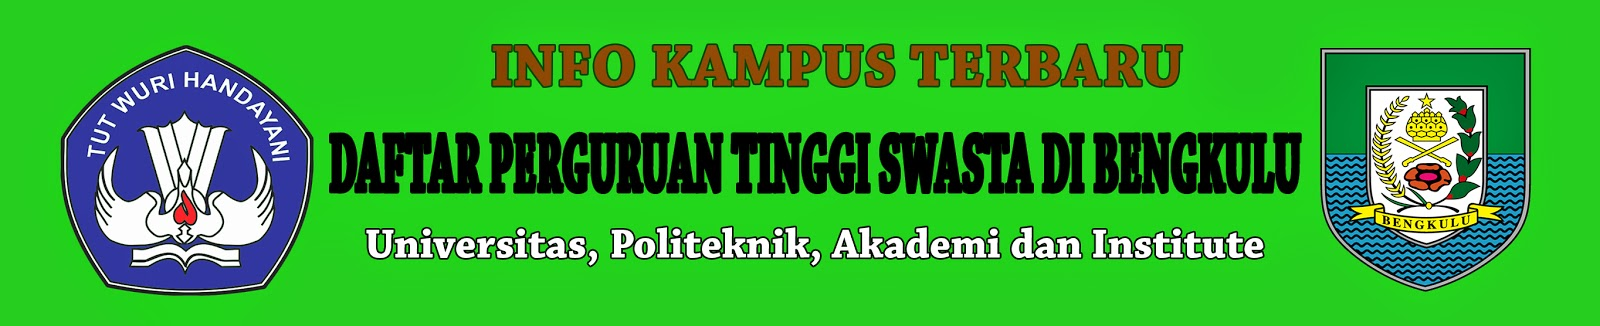 Daftar Perguruan Tinggi Swasta Di Bengkulu